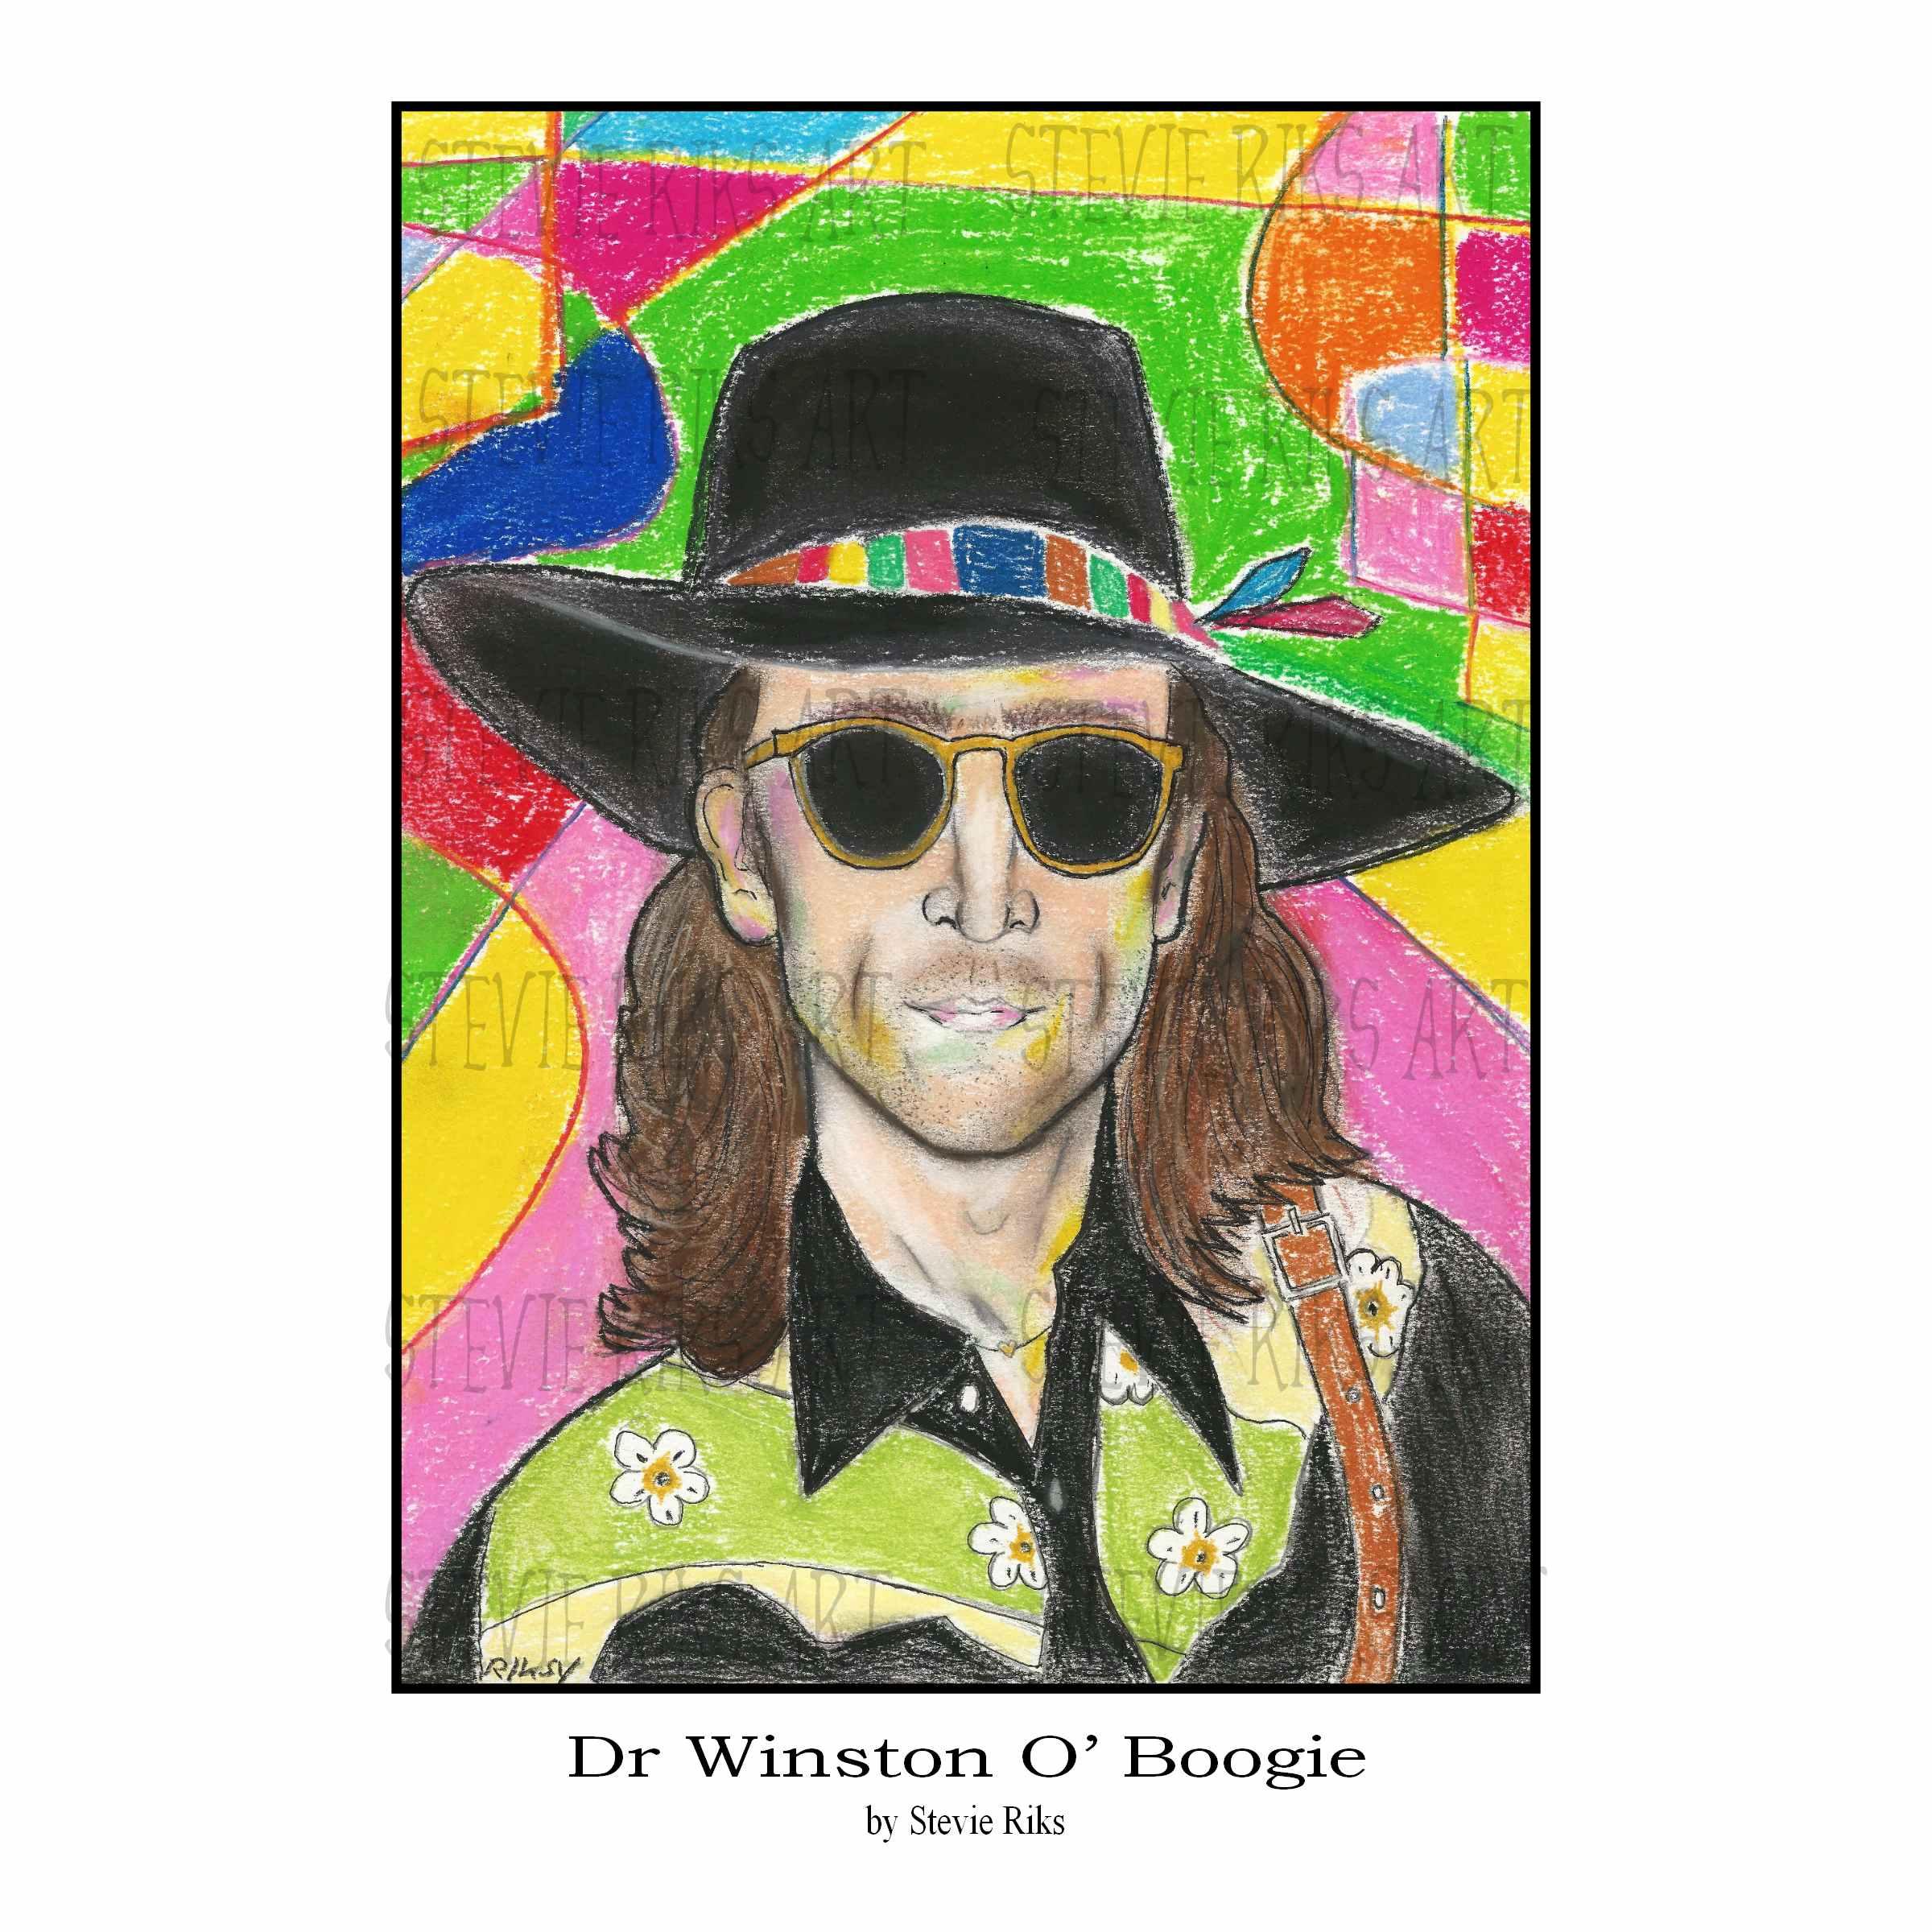 Dr Winston O'Boogie